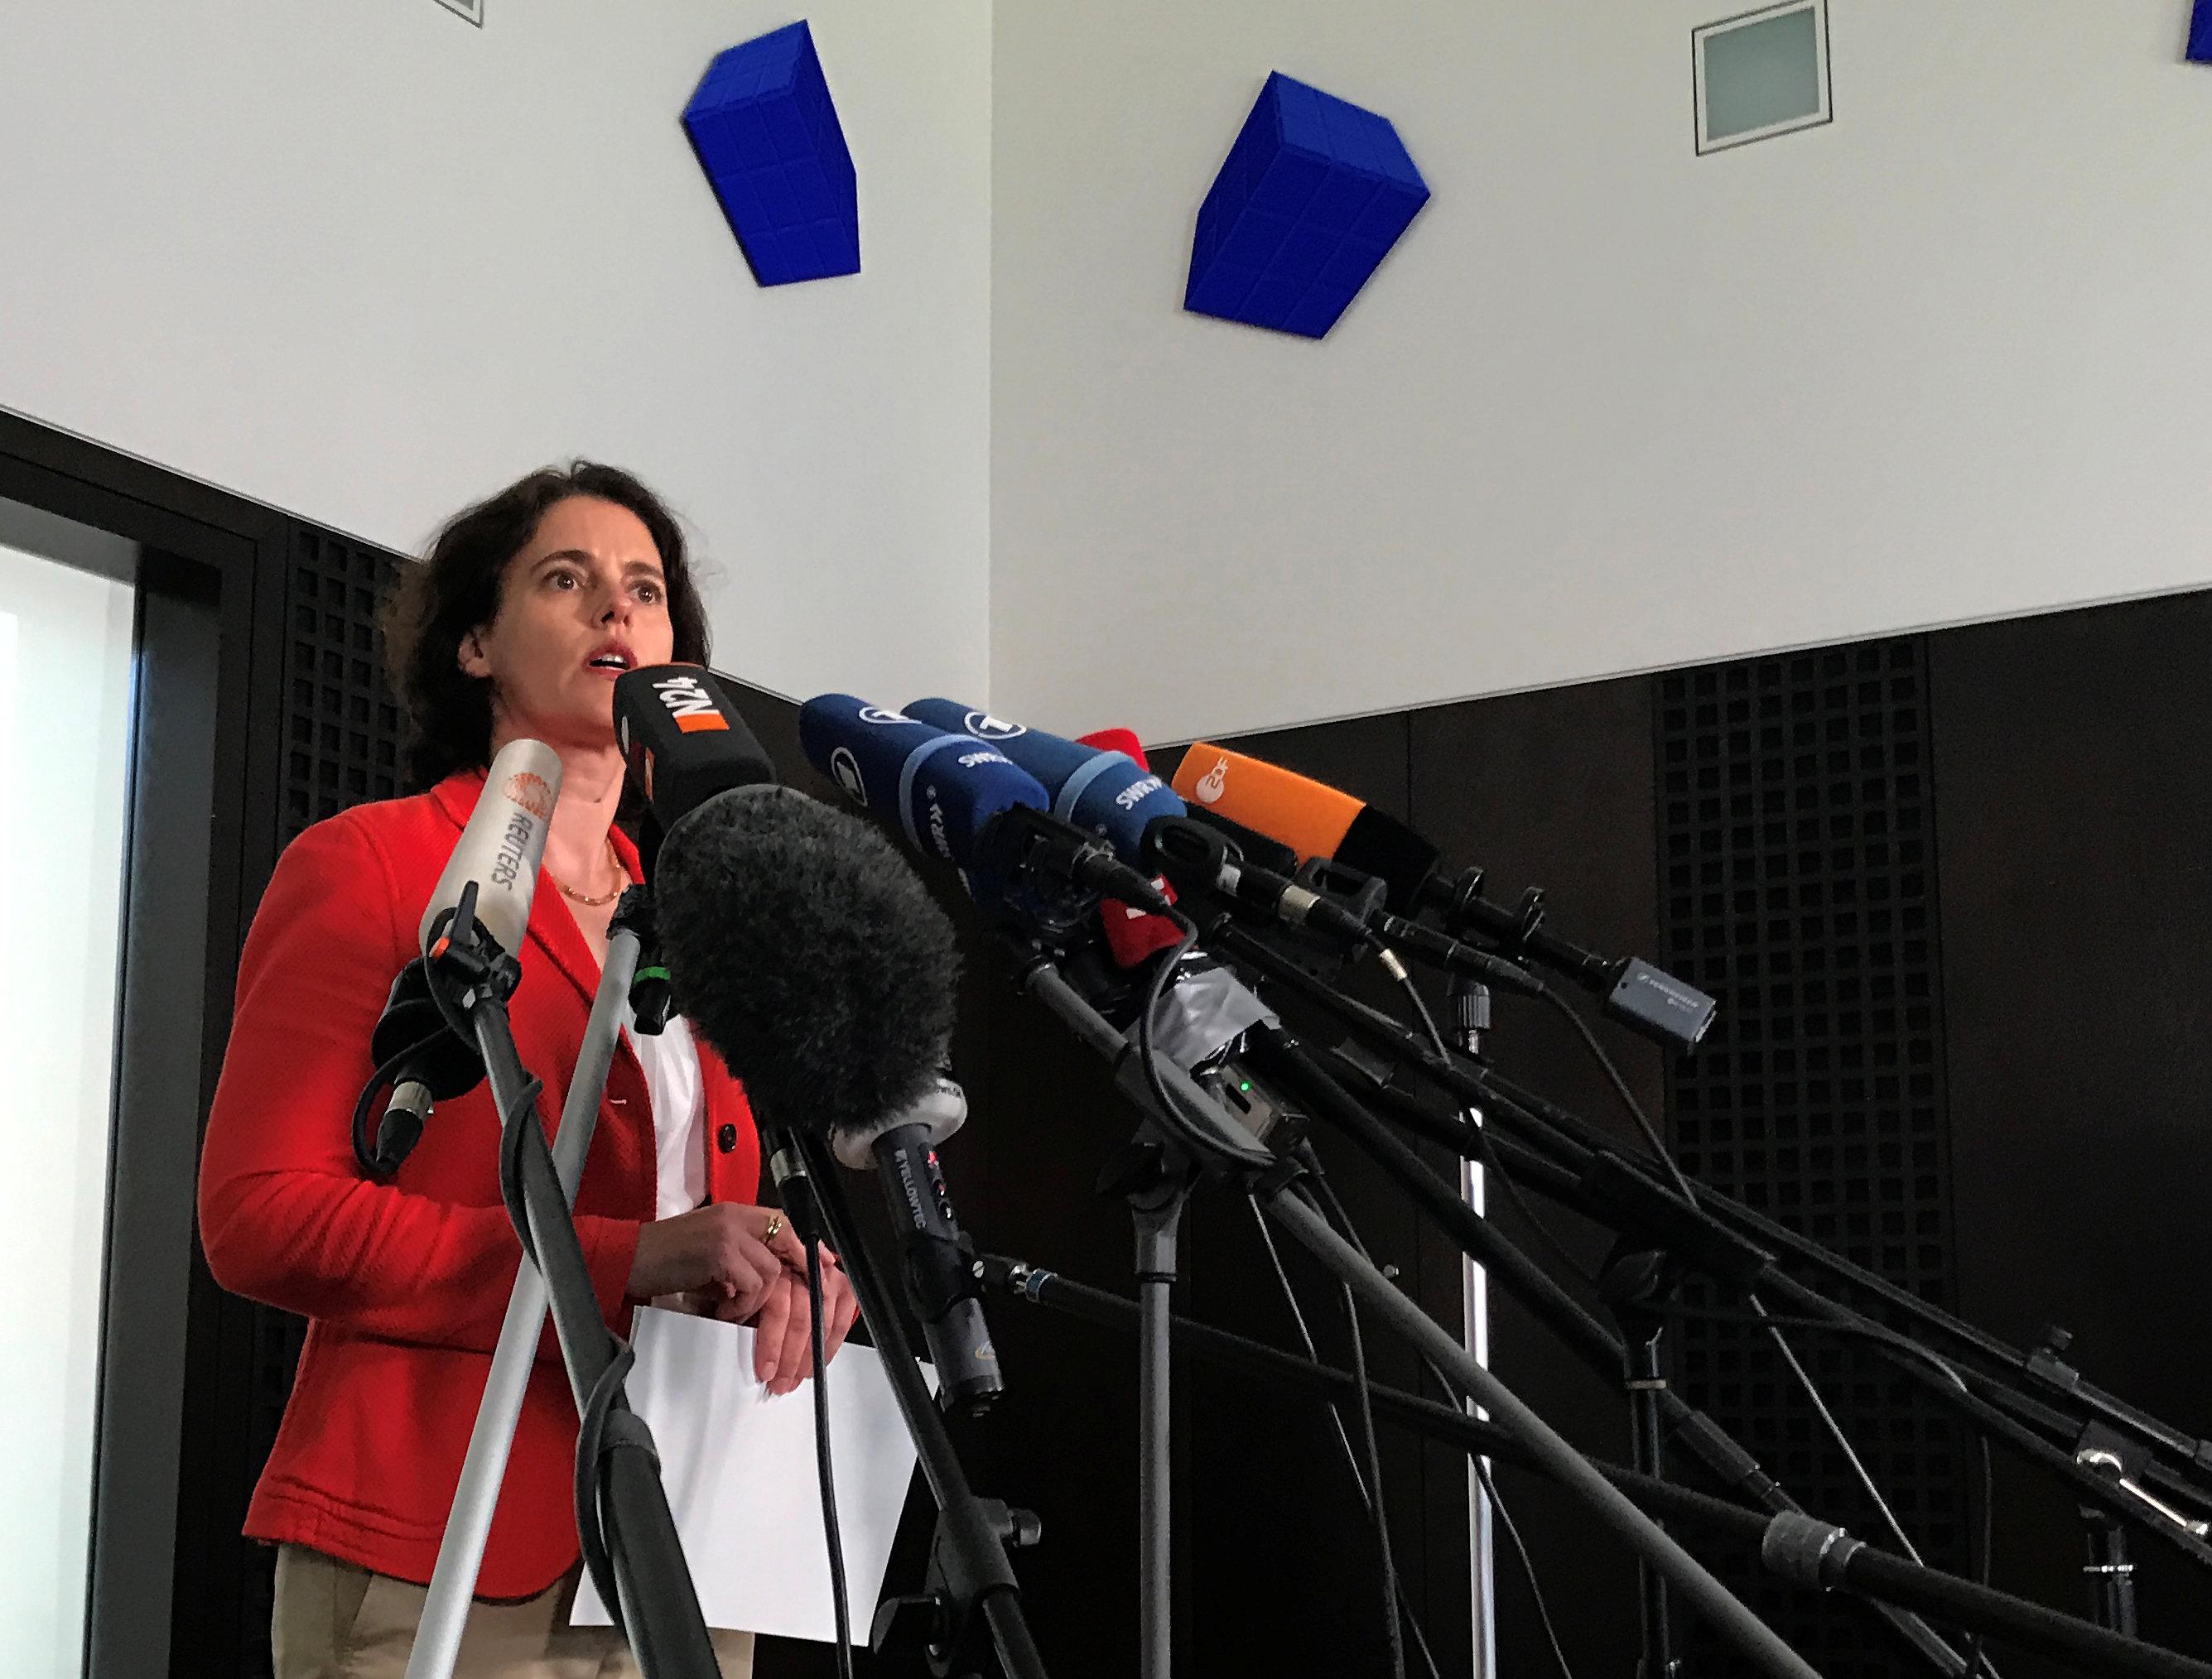 Spokeswoman for federal prosecutors Frauke Koehler gives a statement in Karlsruhe, Germany on April 12, 2017. (REUTERS/Tilman Blasshofer)